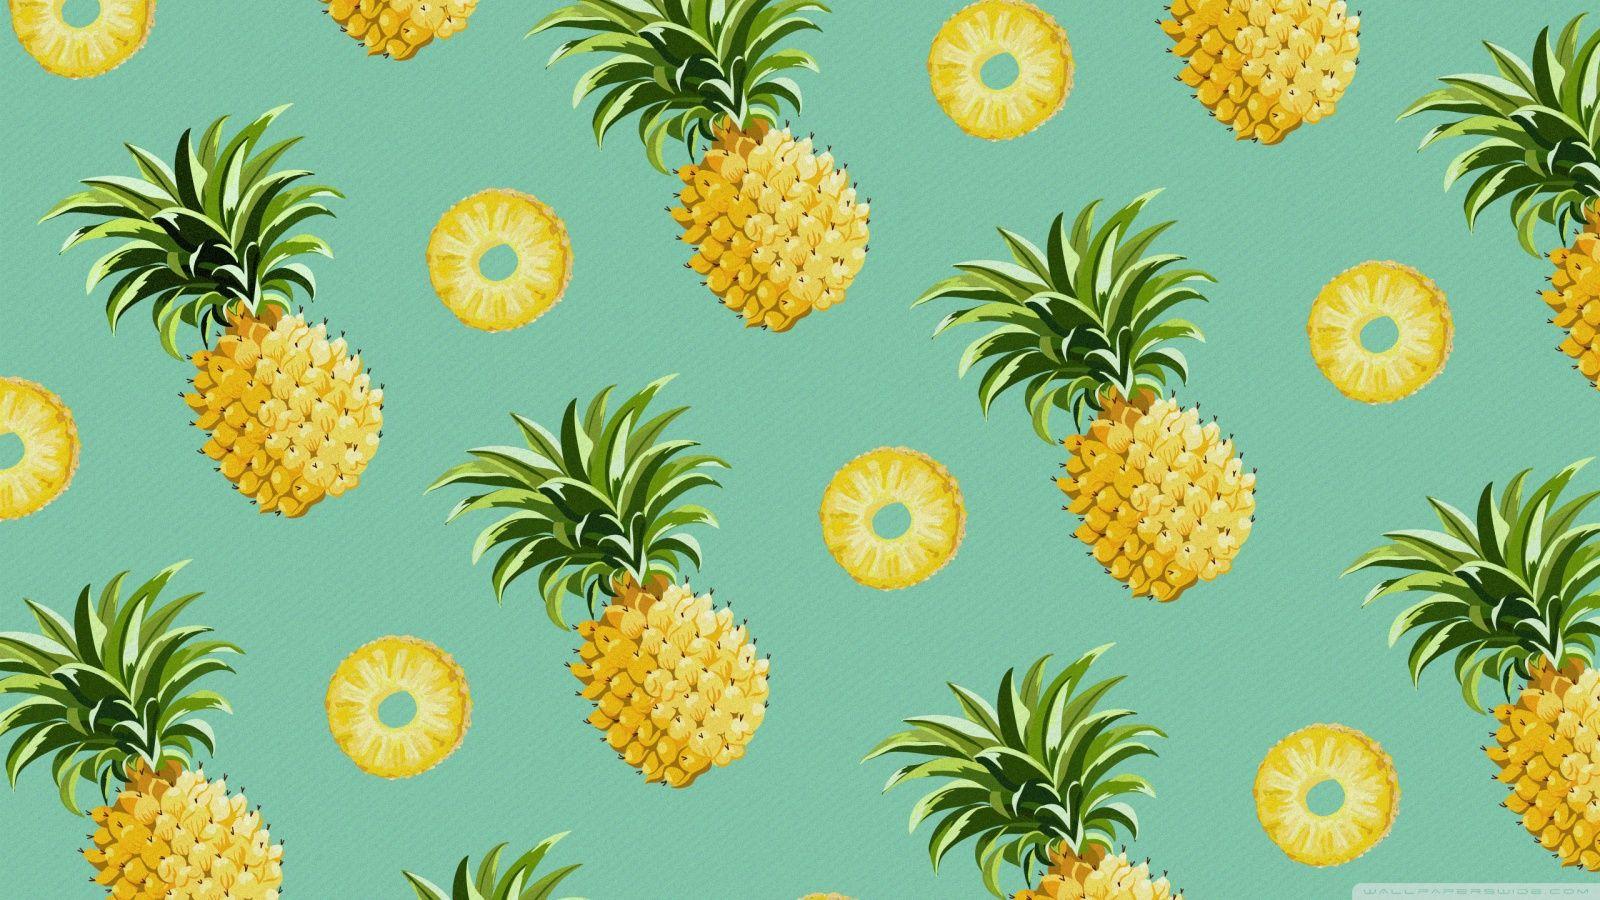 Cool Pineapples Lucu